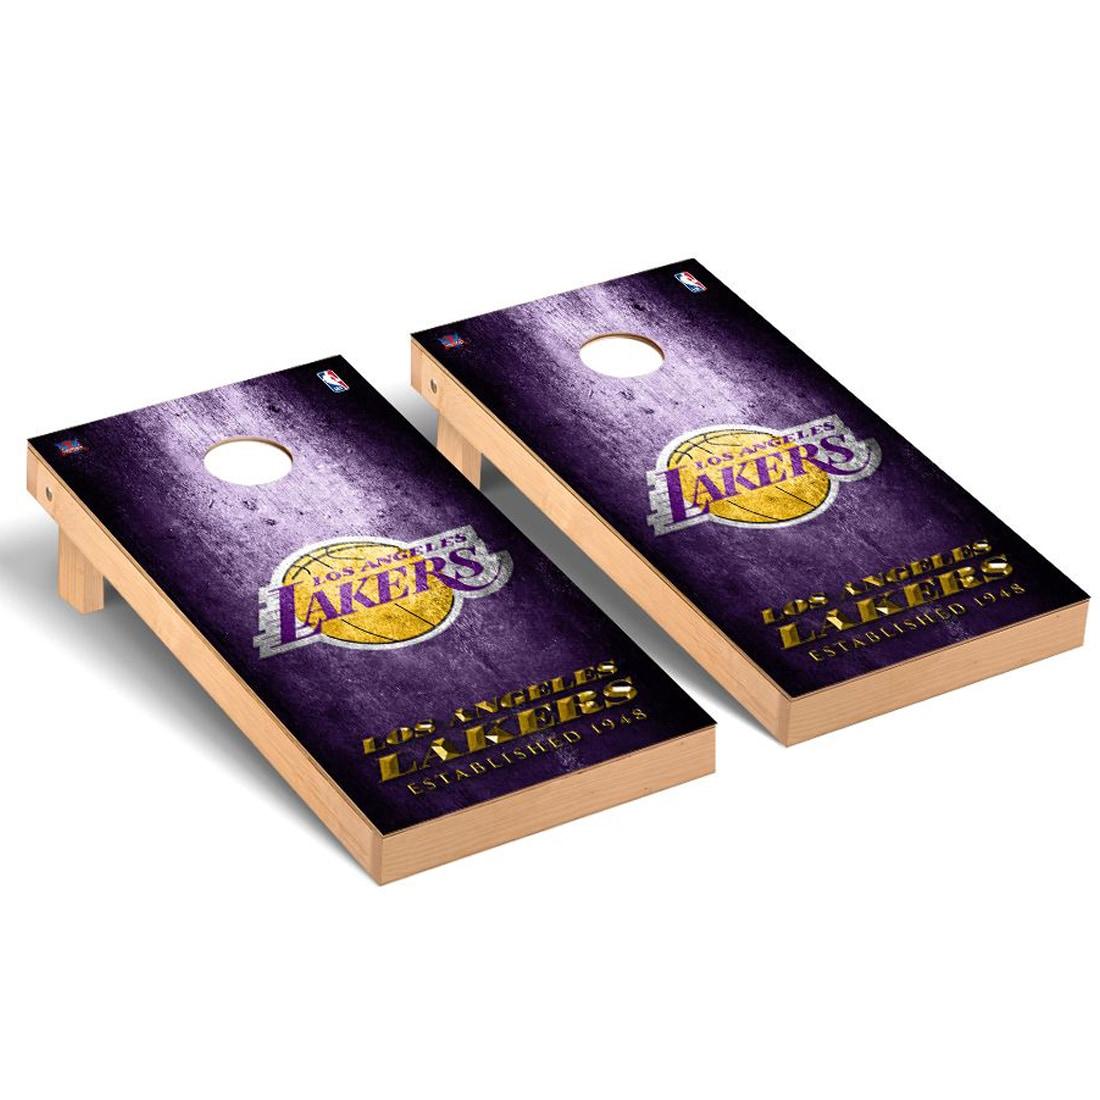 Los Angeles Lakers 2' x 4' Metal Design Cornhole Game Set